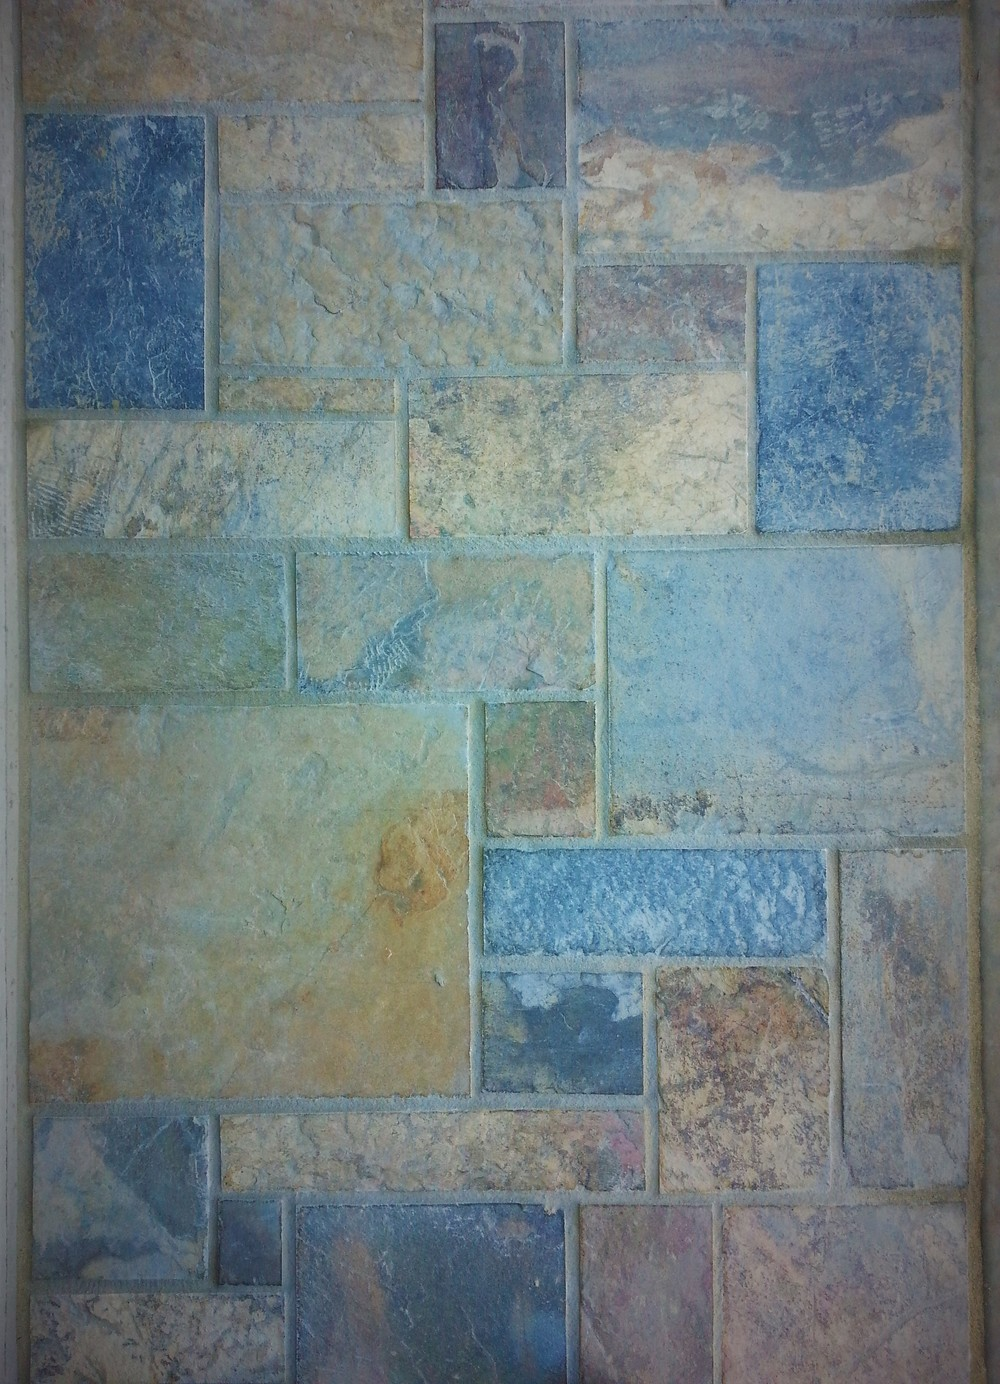 Kanmantoo Bluestone dimensioned paving. South Australia.